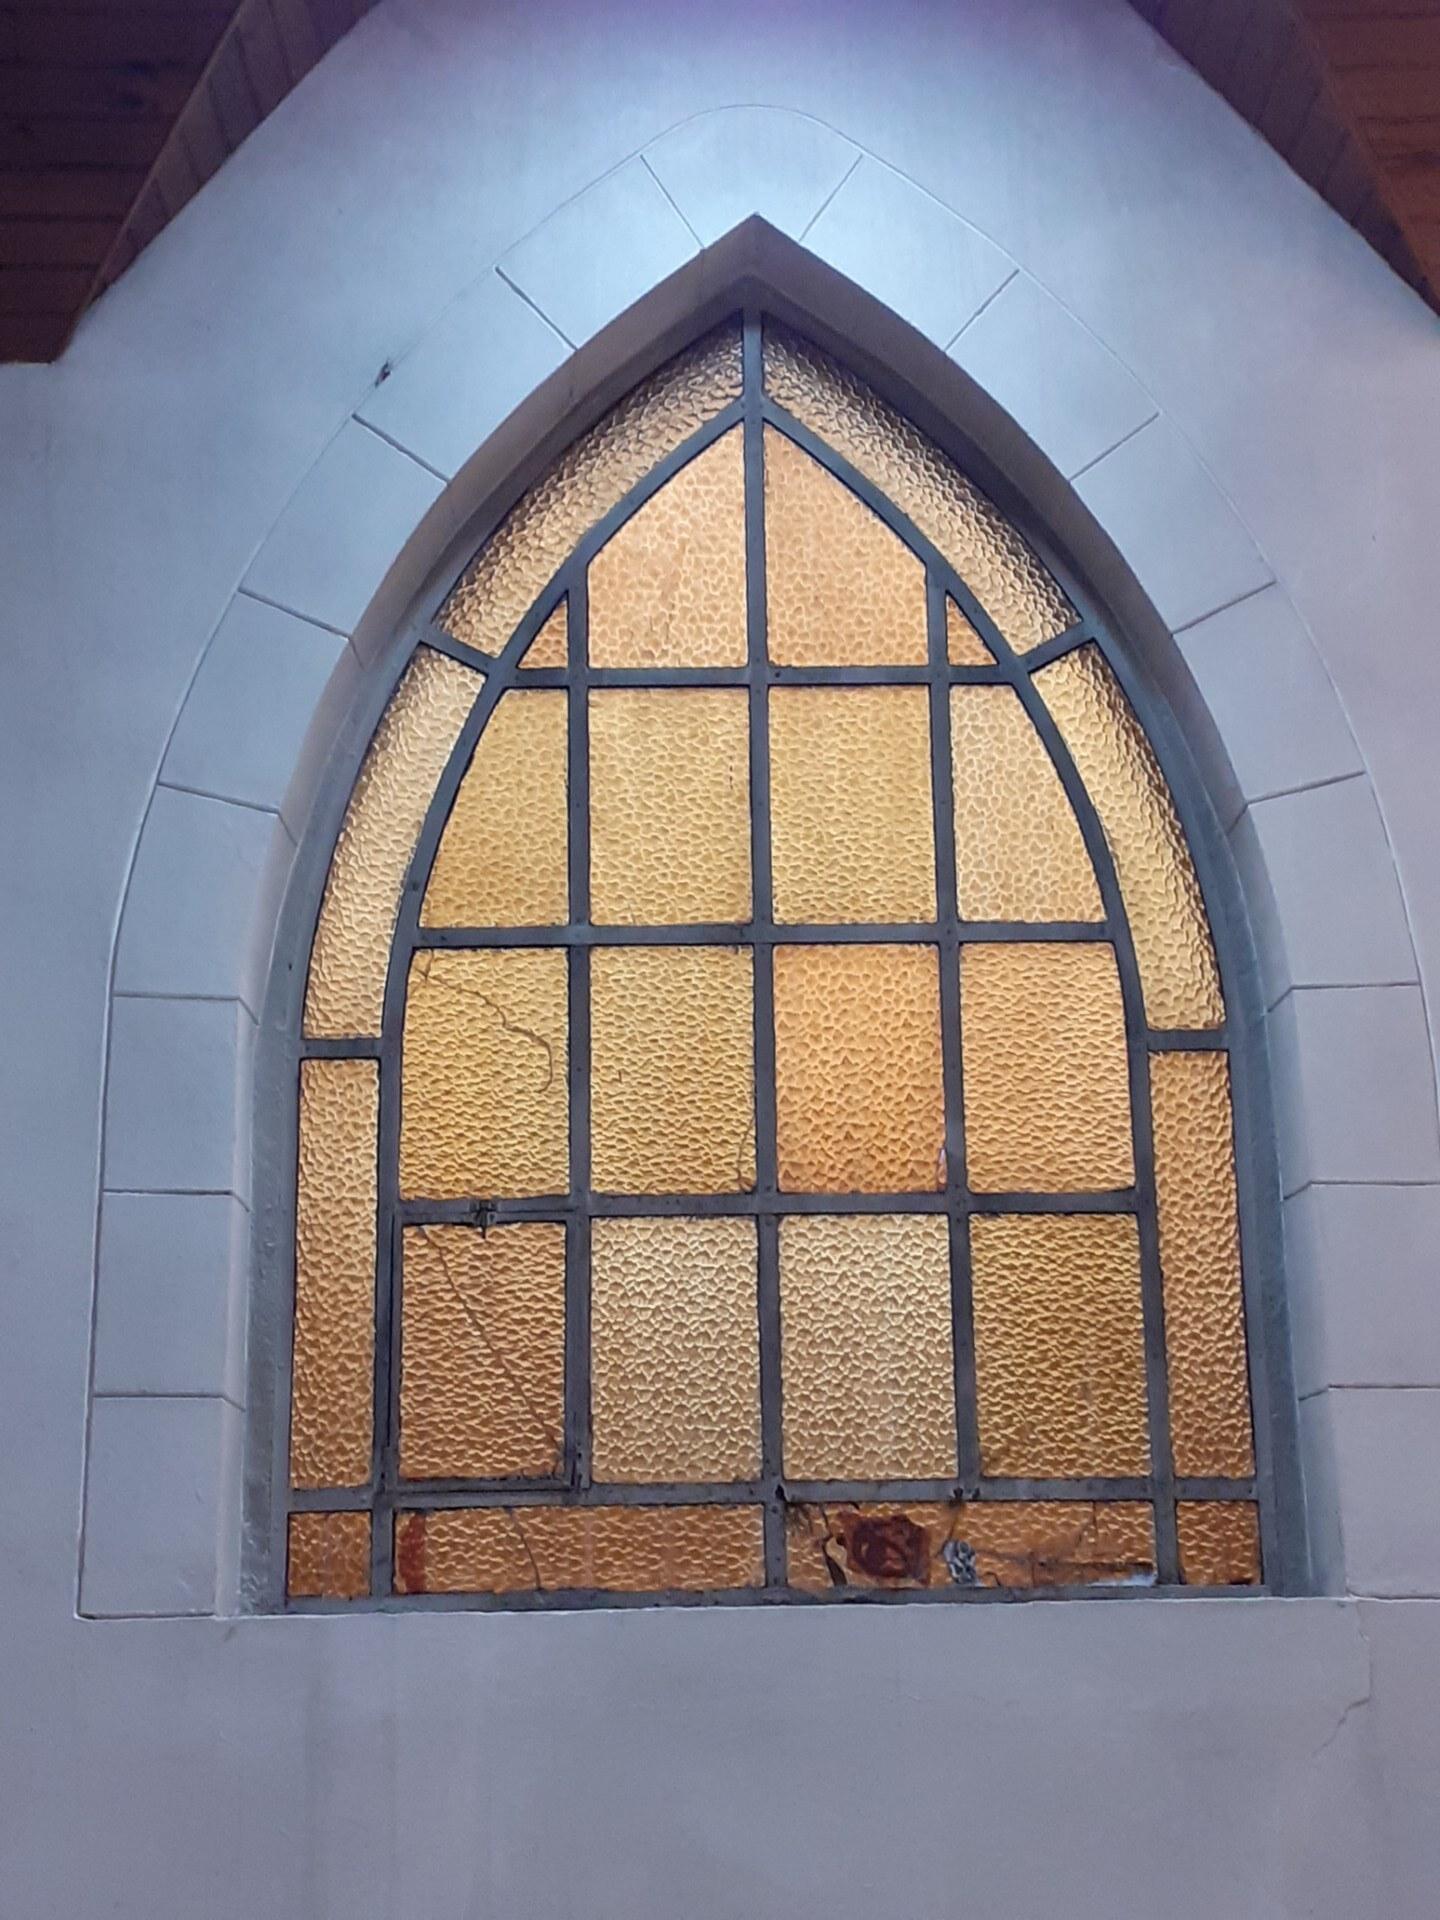 vitraux Ste Thérèse 2